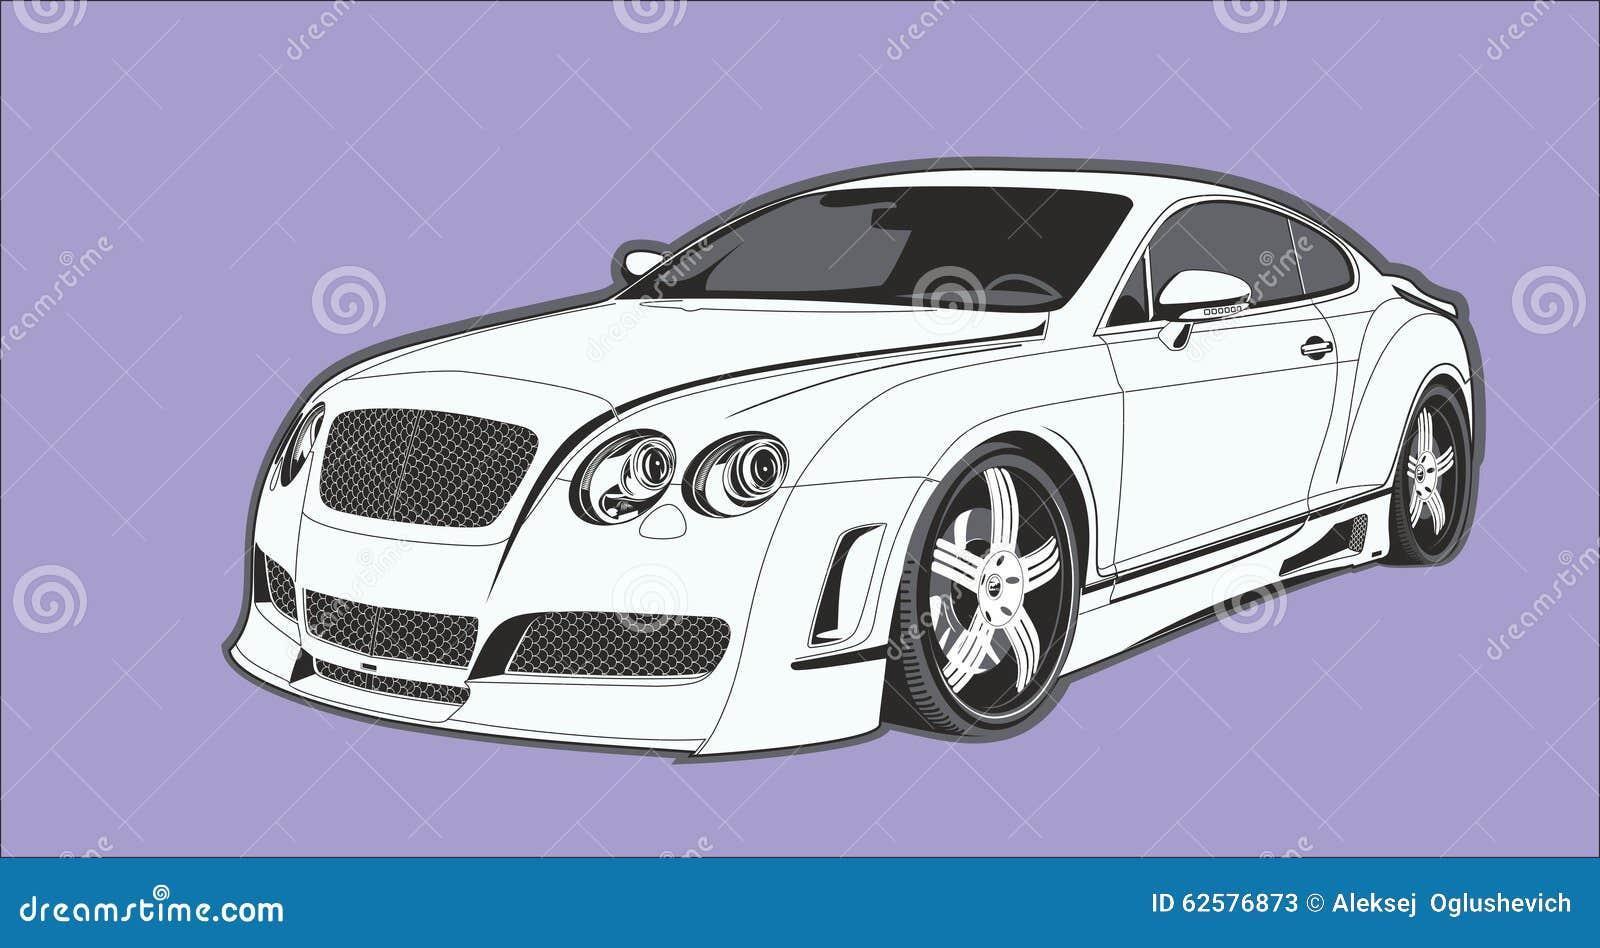 The conceptual car stock illustration. Illustration of sedan - 62576873